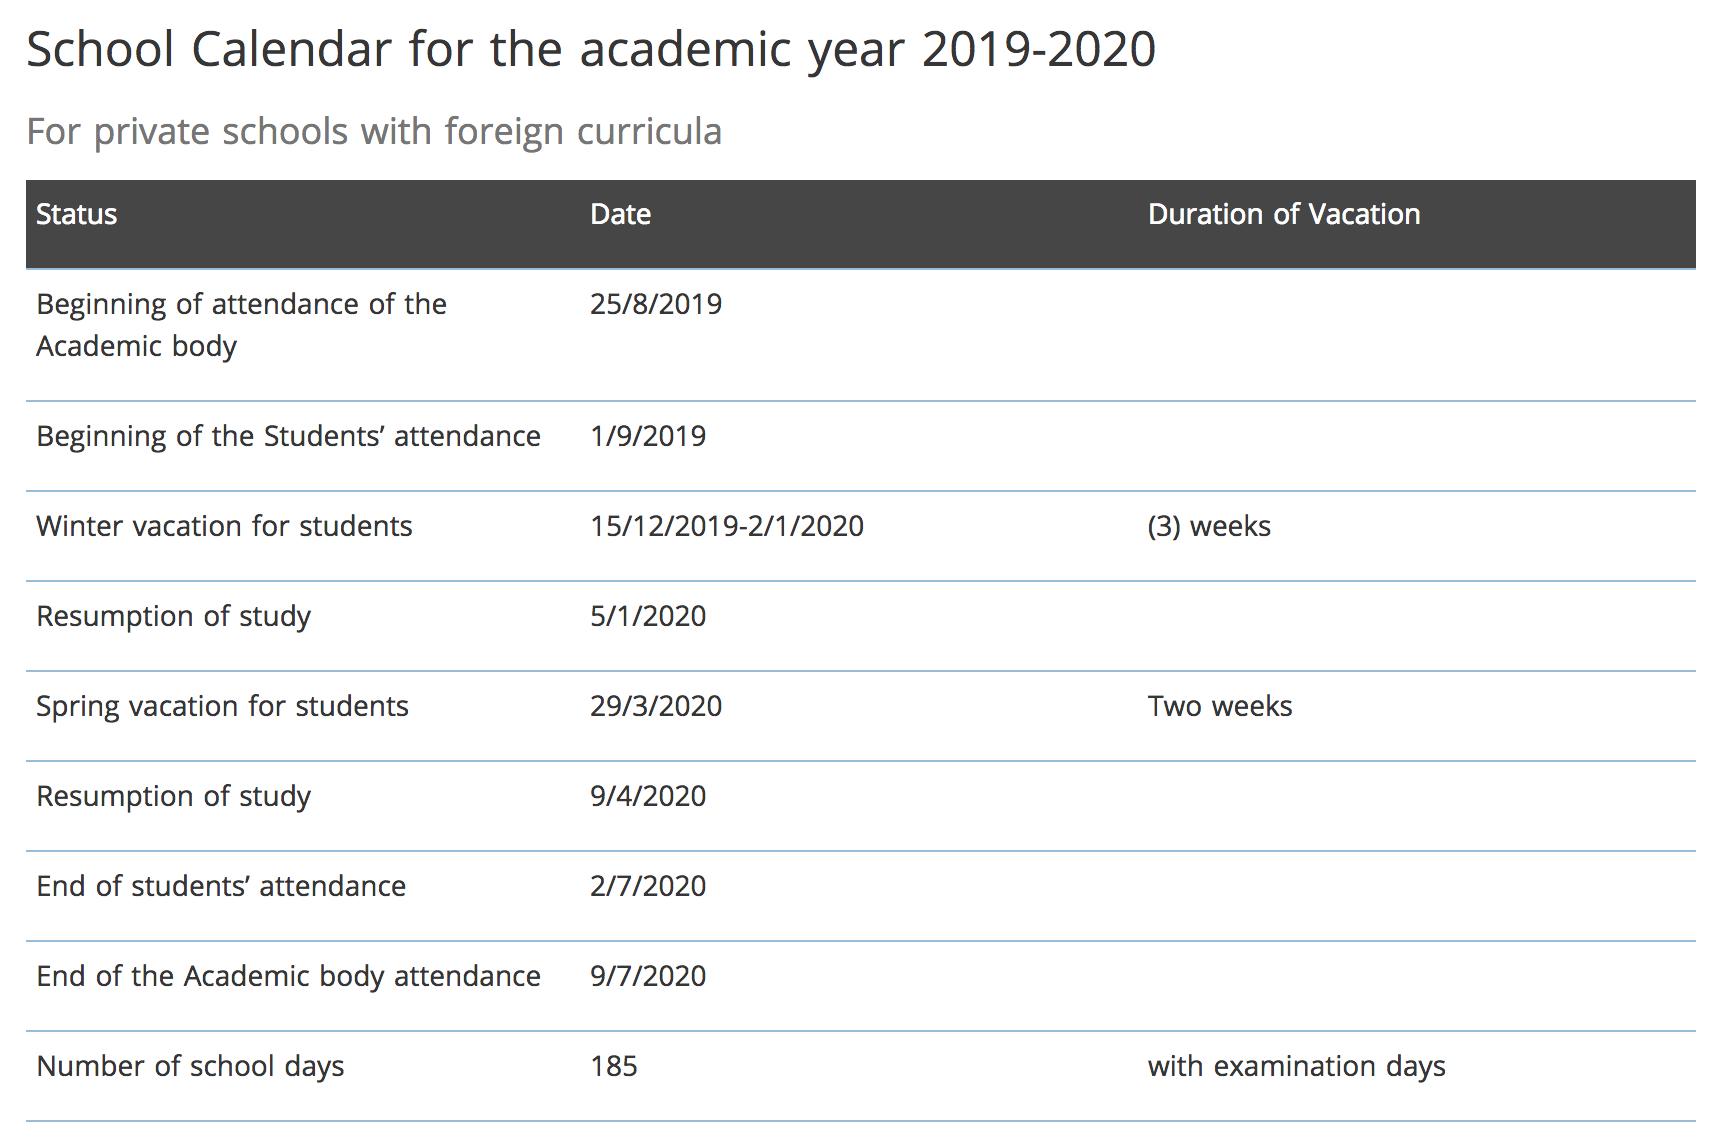 Here's The 2019-2020 Uae School Calendar - Khaleej Times